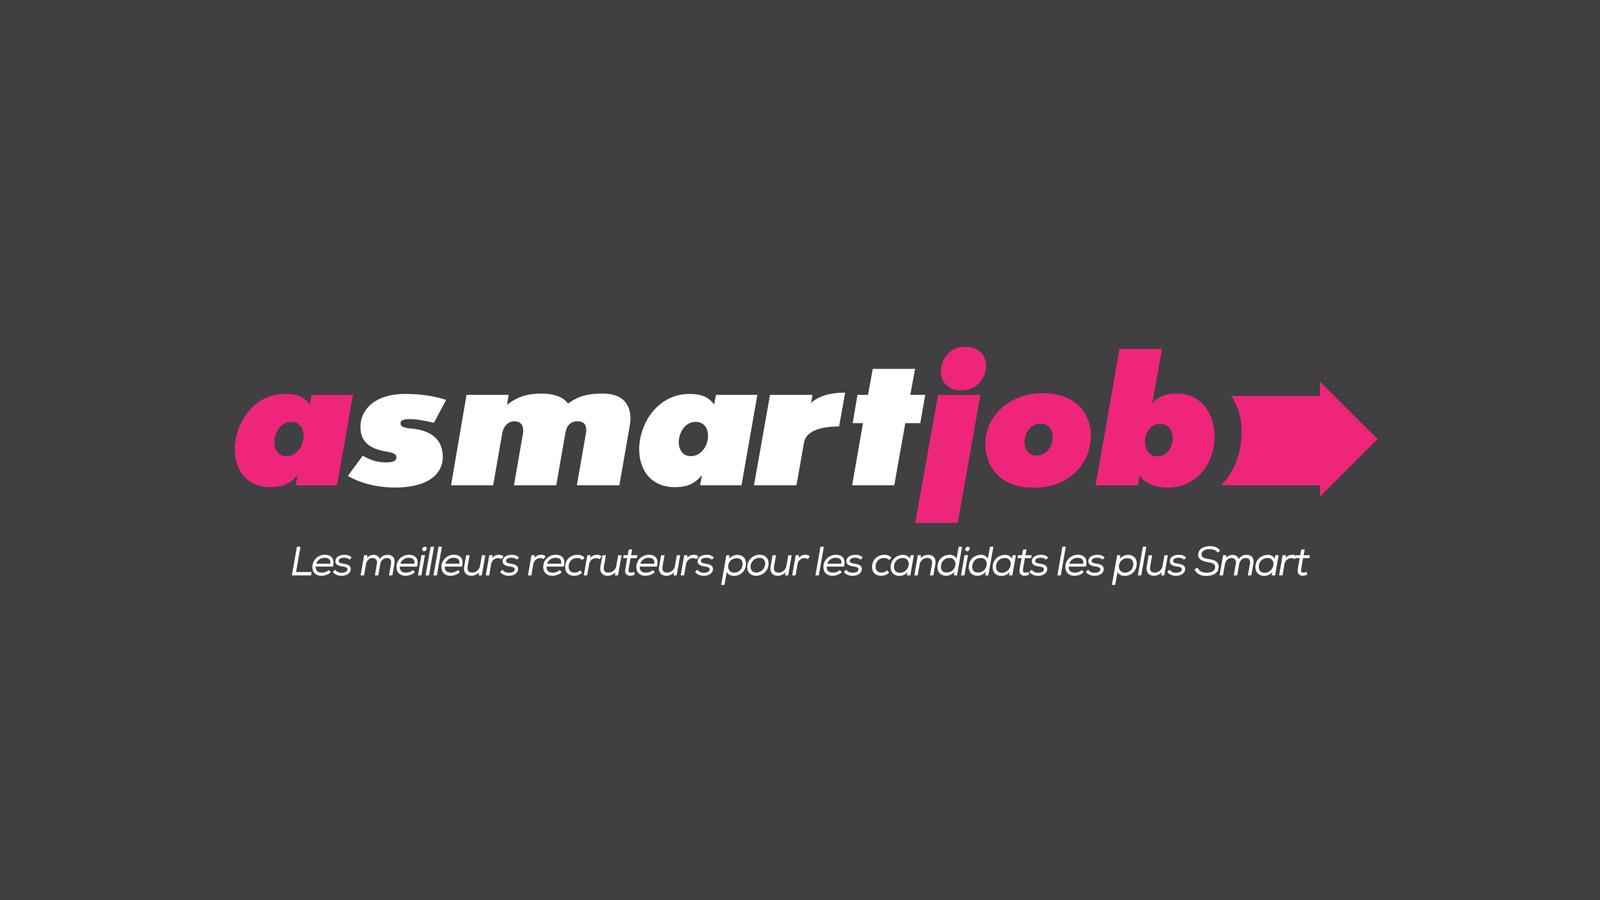 sublime-digital_branding_a-smart-job-01